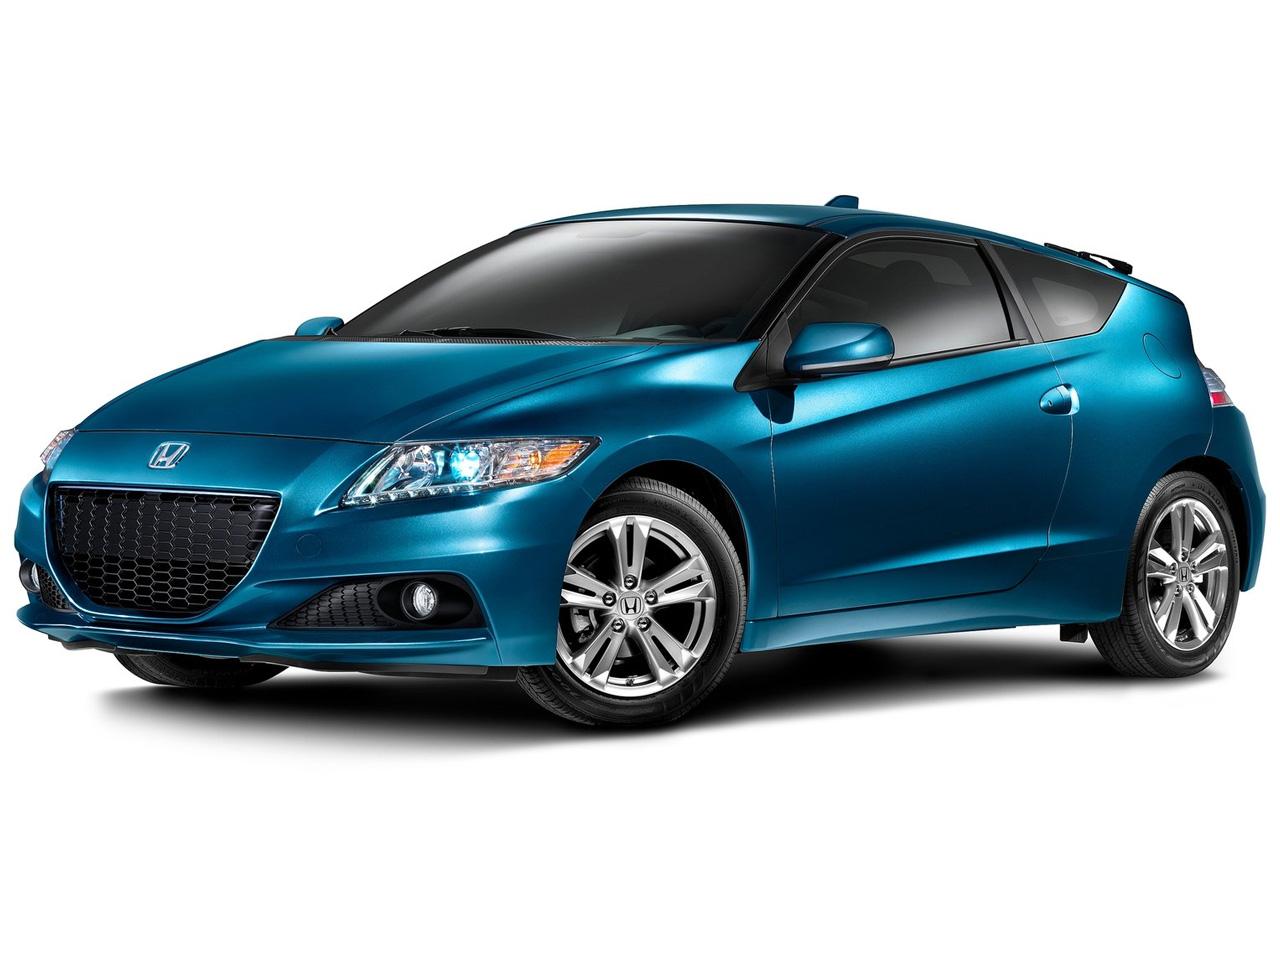 Honda 2013 honda crz : 2013 Honda CR-Z US-Version. ~ Show Car To U